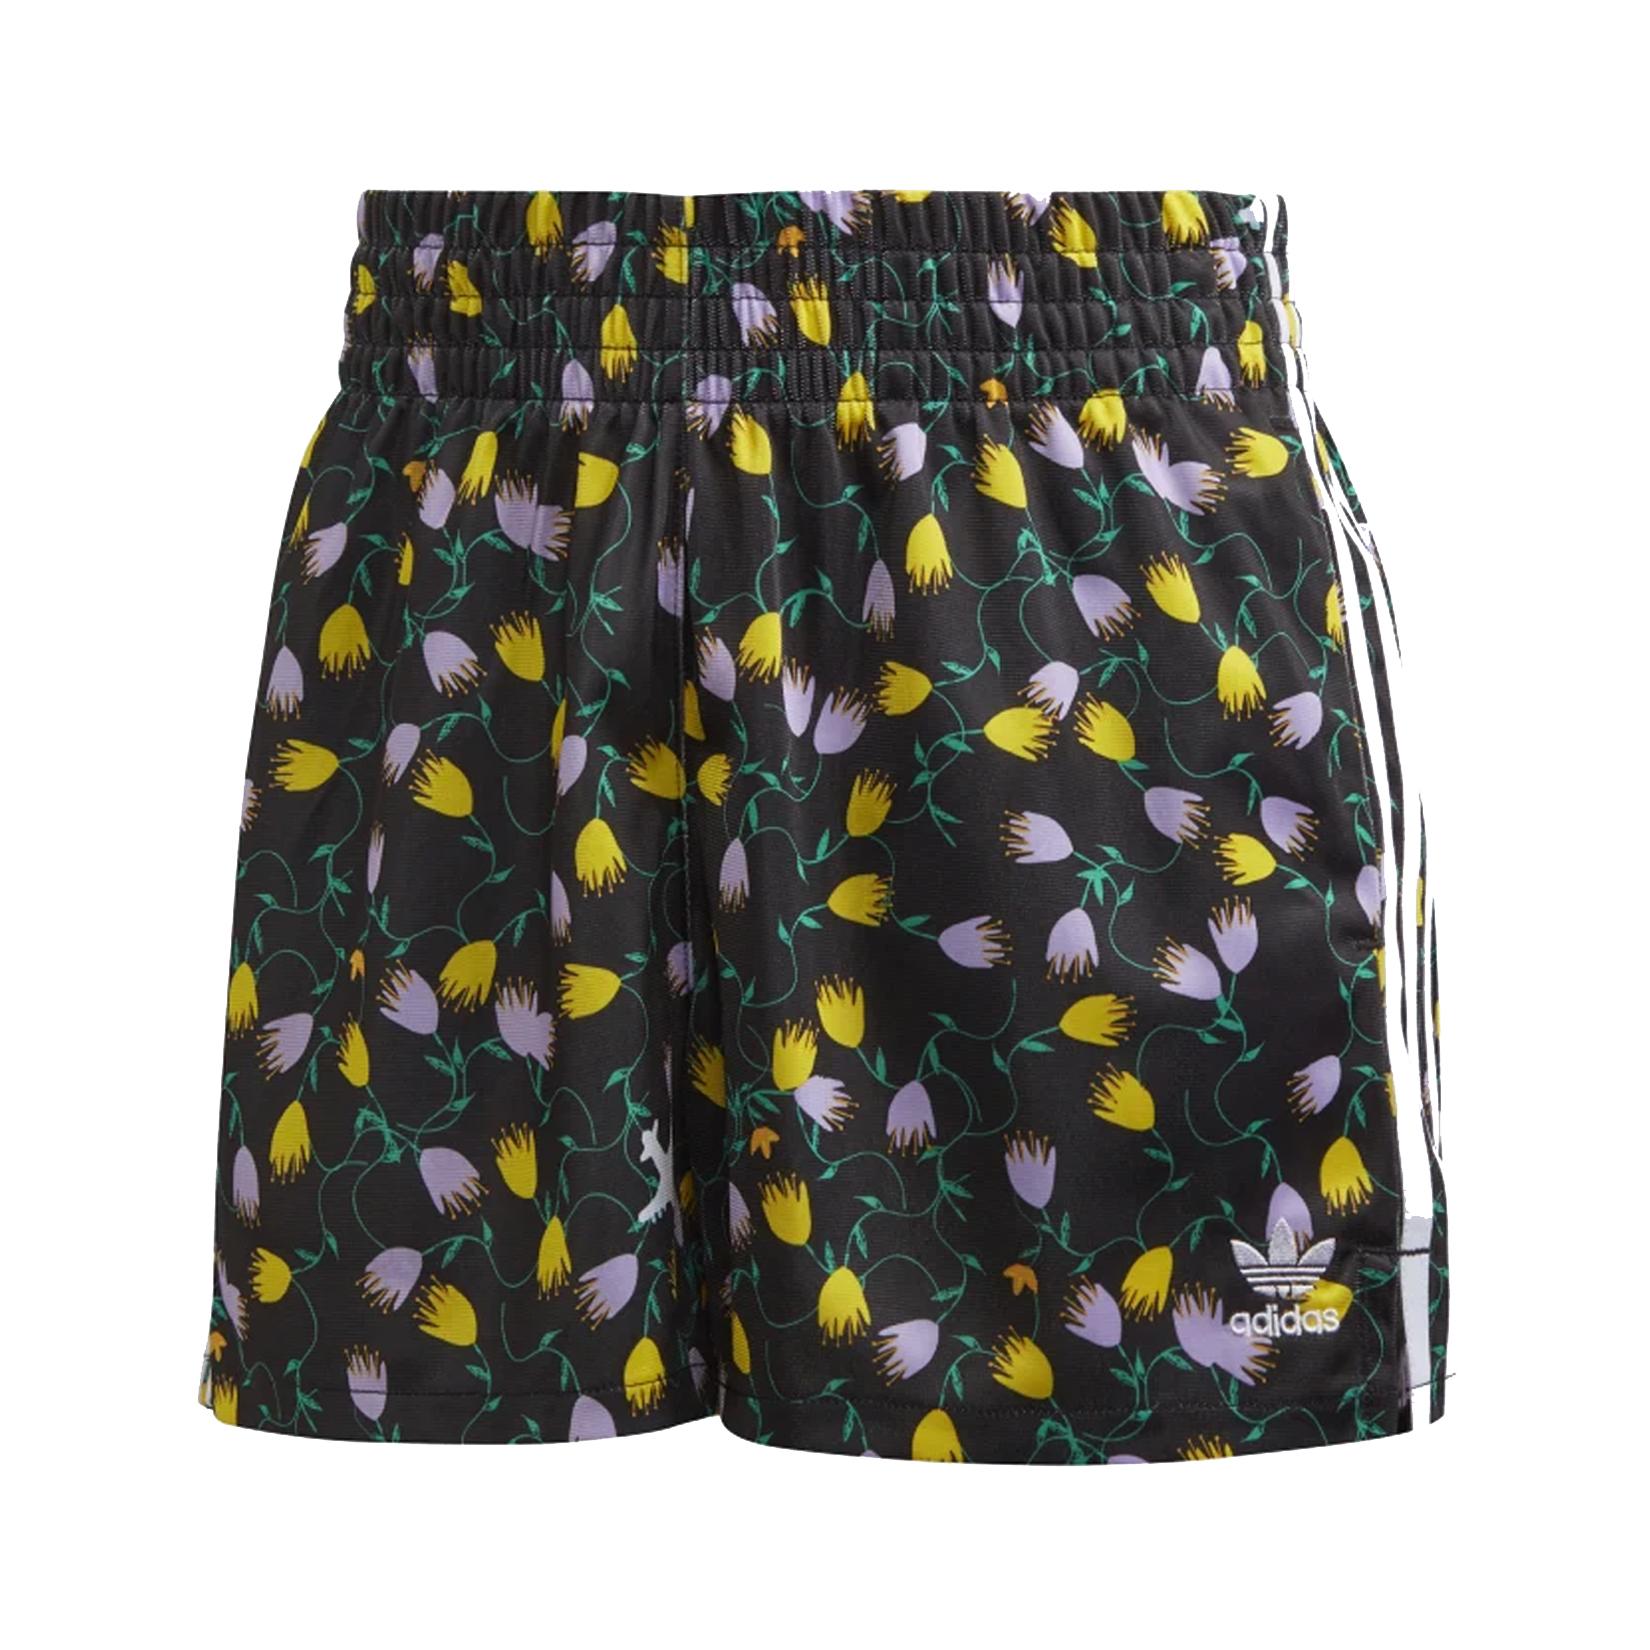 Adidas Originals 3-Stripes Allover Print Floral